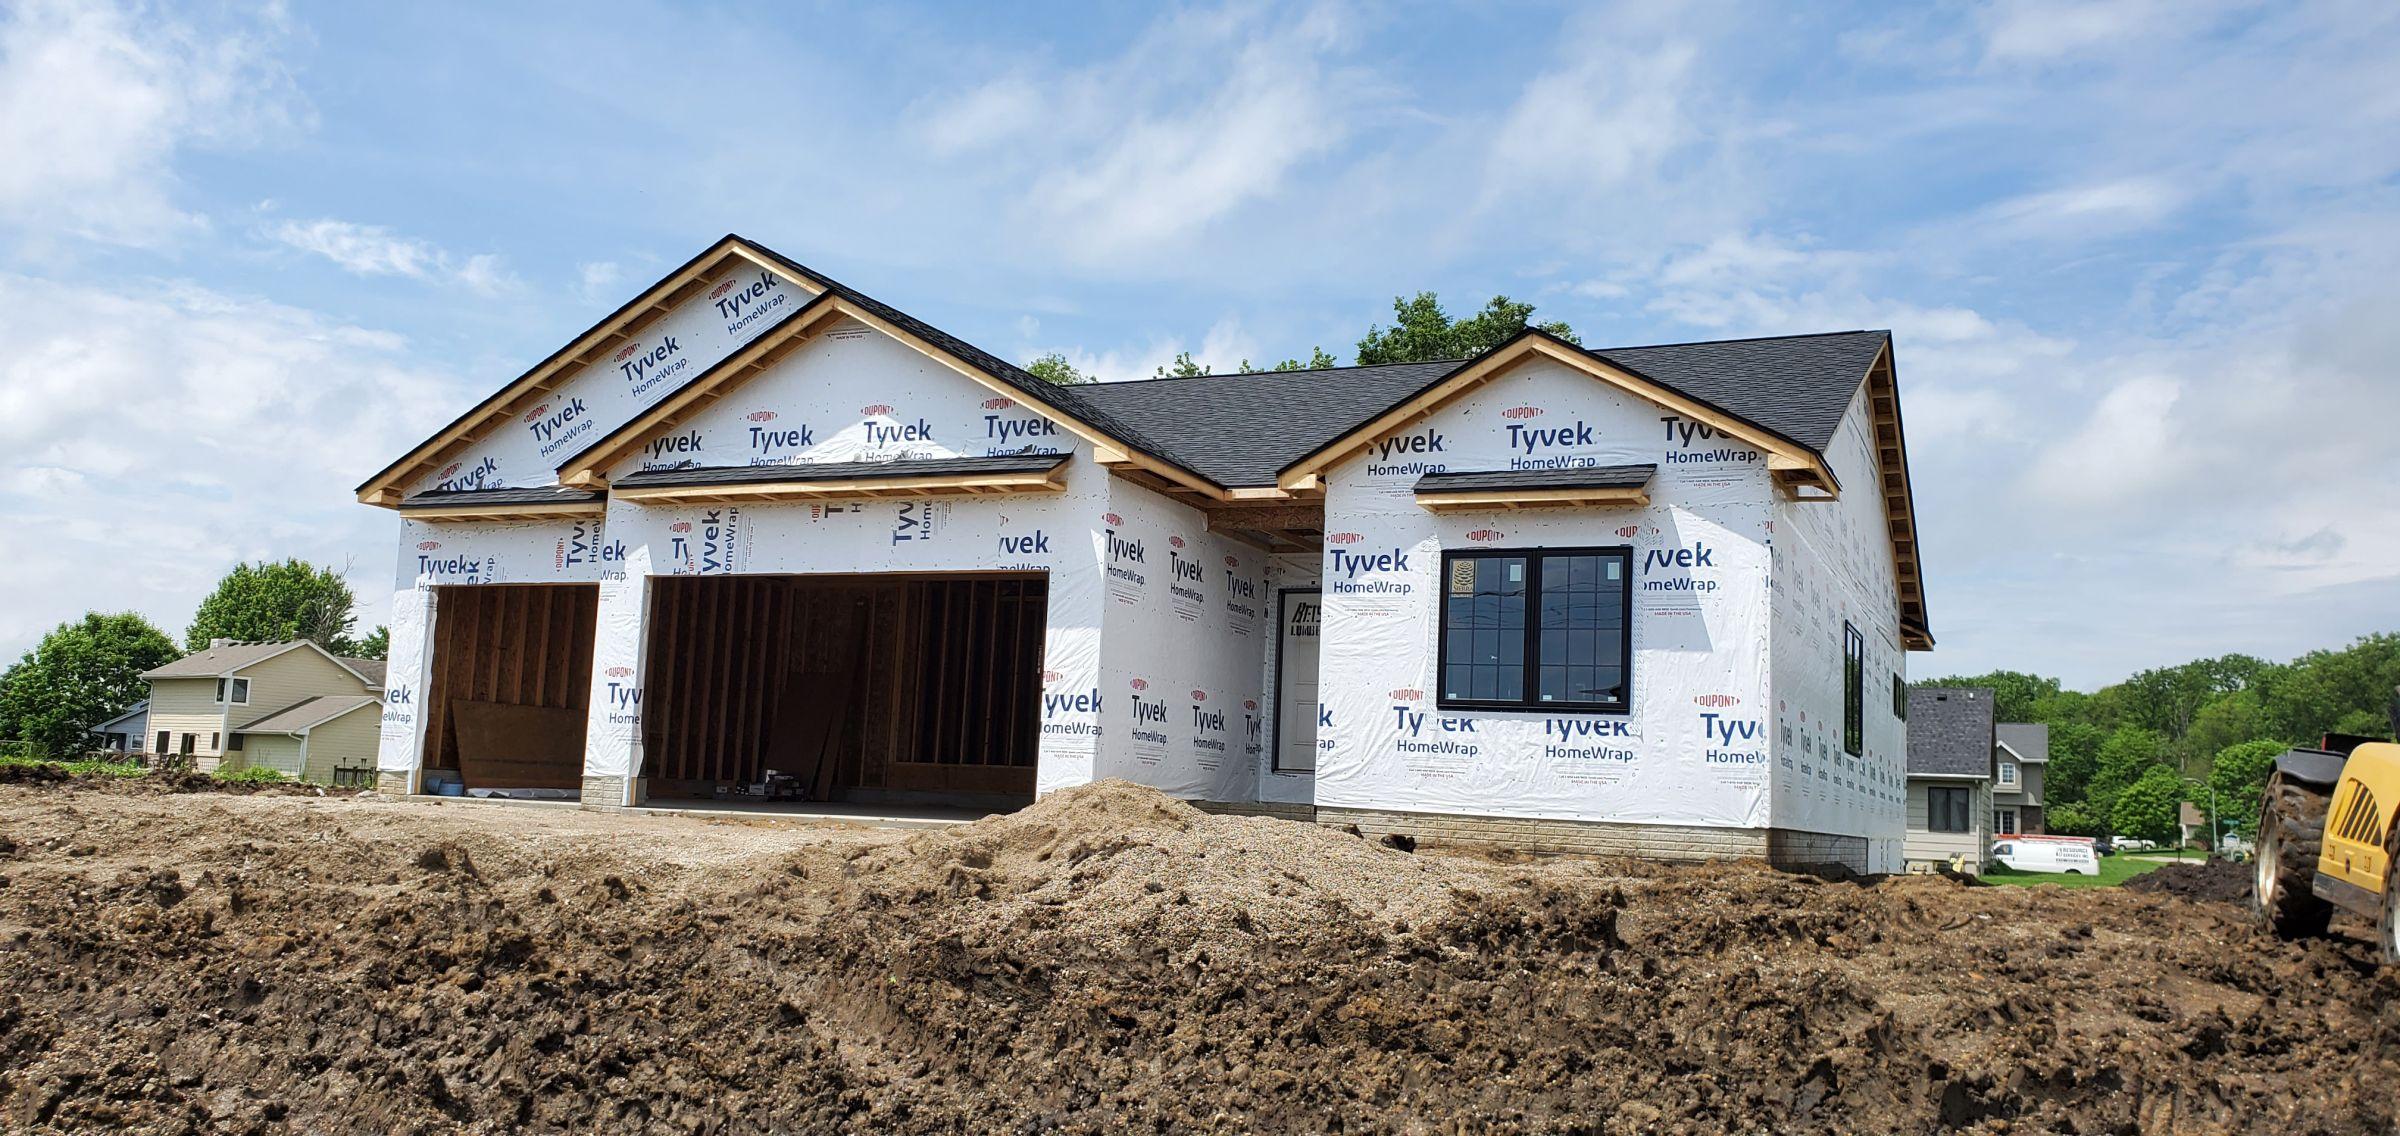 residential-polk-county-iowa-0-acres-listing-number-14997-0-2020-05-26-202513.jpg